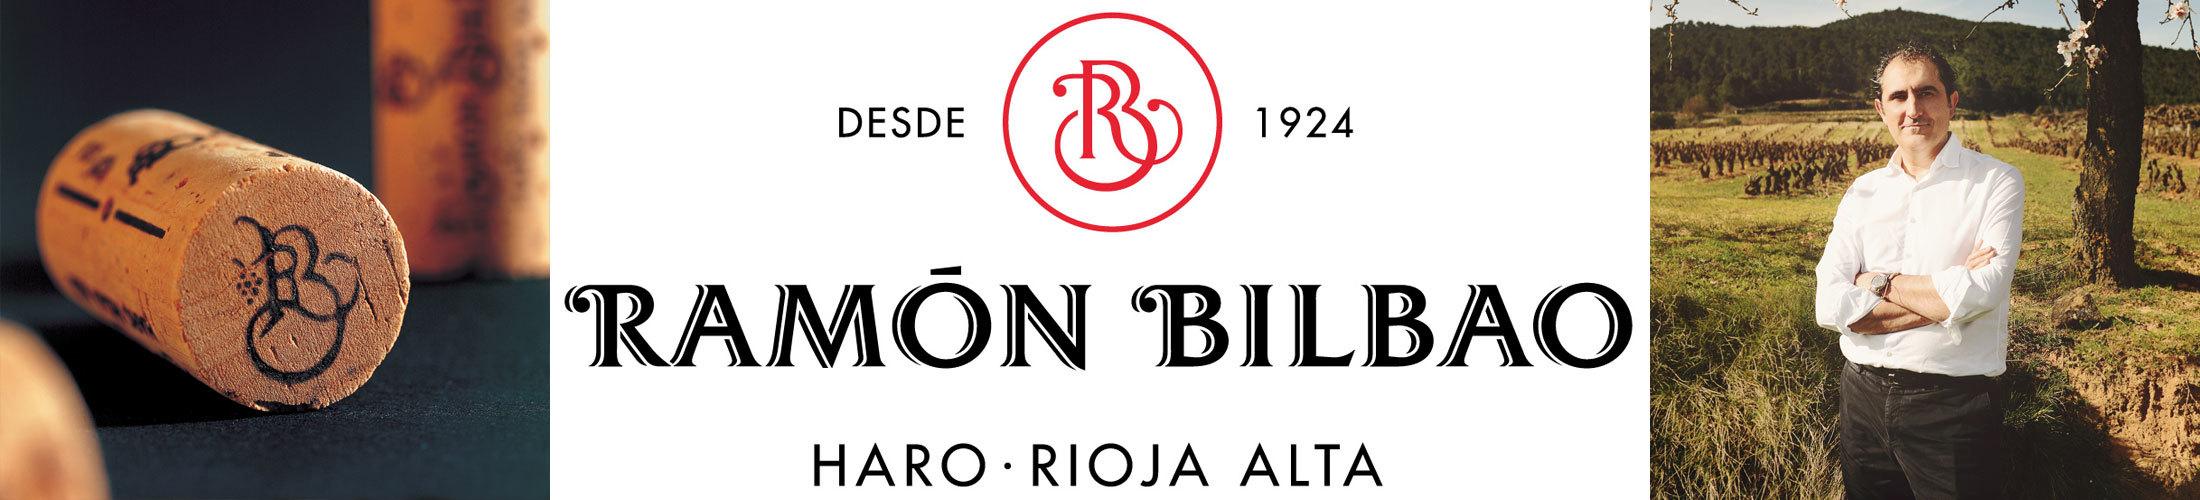 Ramon Bilbao 1